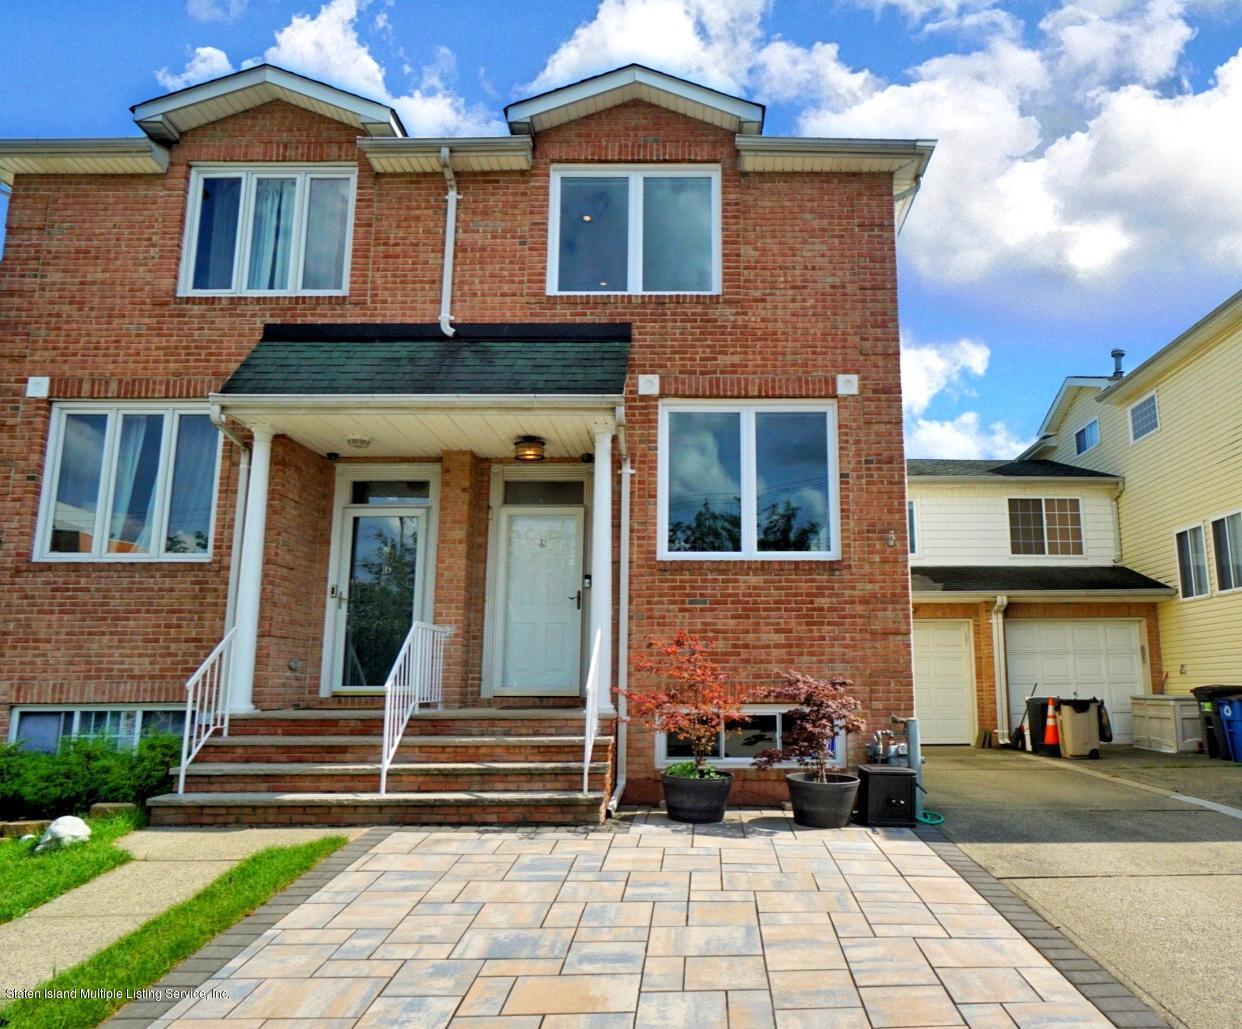 Single Family - Semi-Attached 18 Dunhill Lane  Staten Island, NY 10309, MLS-1139055-2